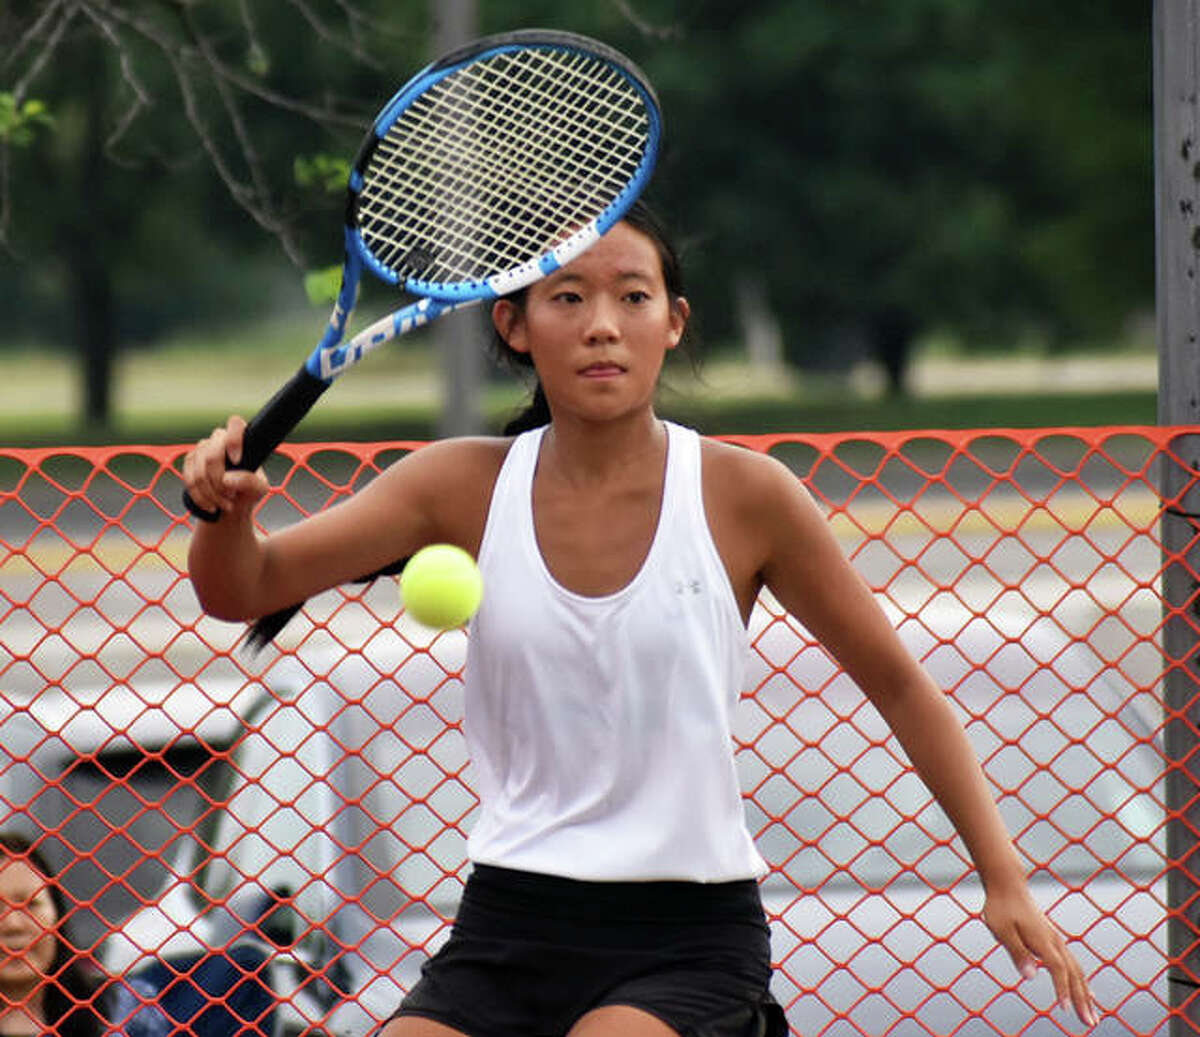 Edwardsville's Eileen Pan hits a return shot during her doubles match against O'Fallon on Thursday inside the EHS Tennis Center.